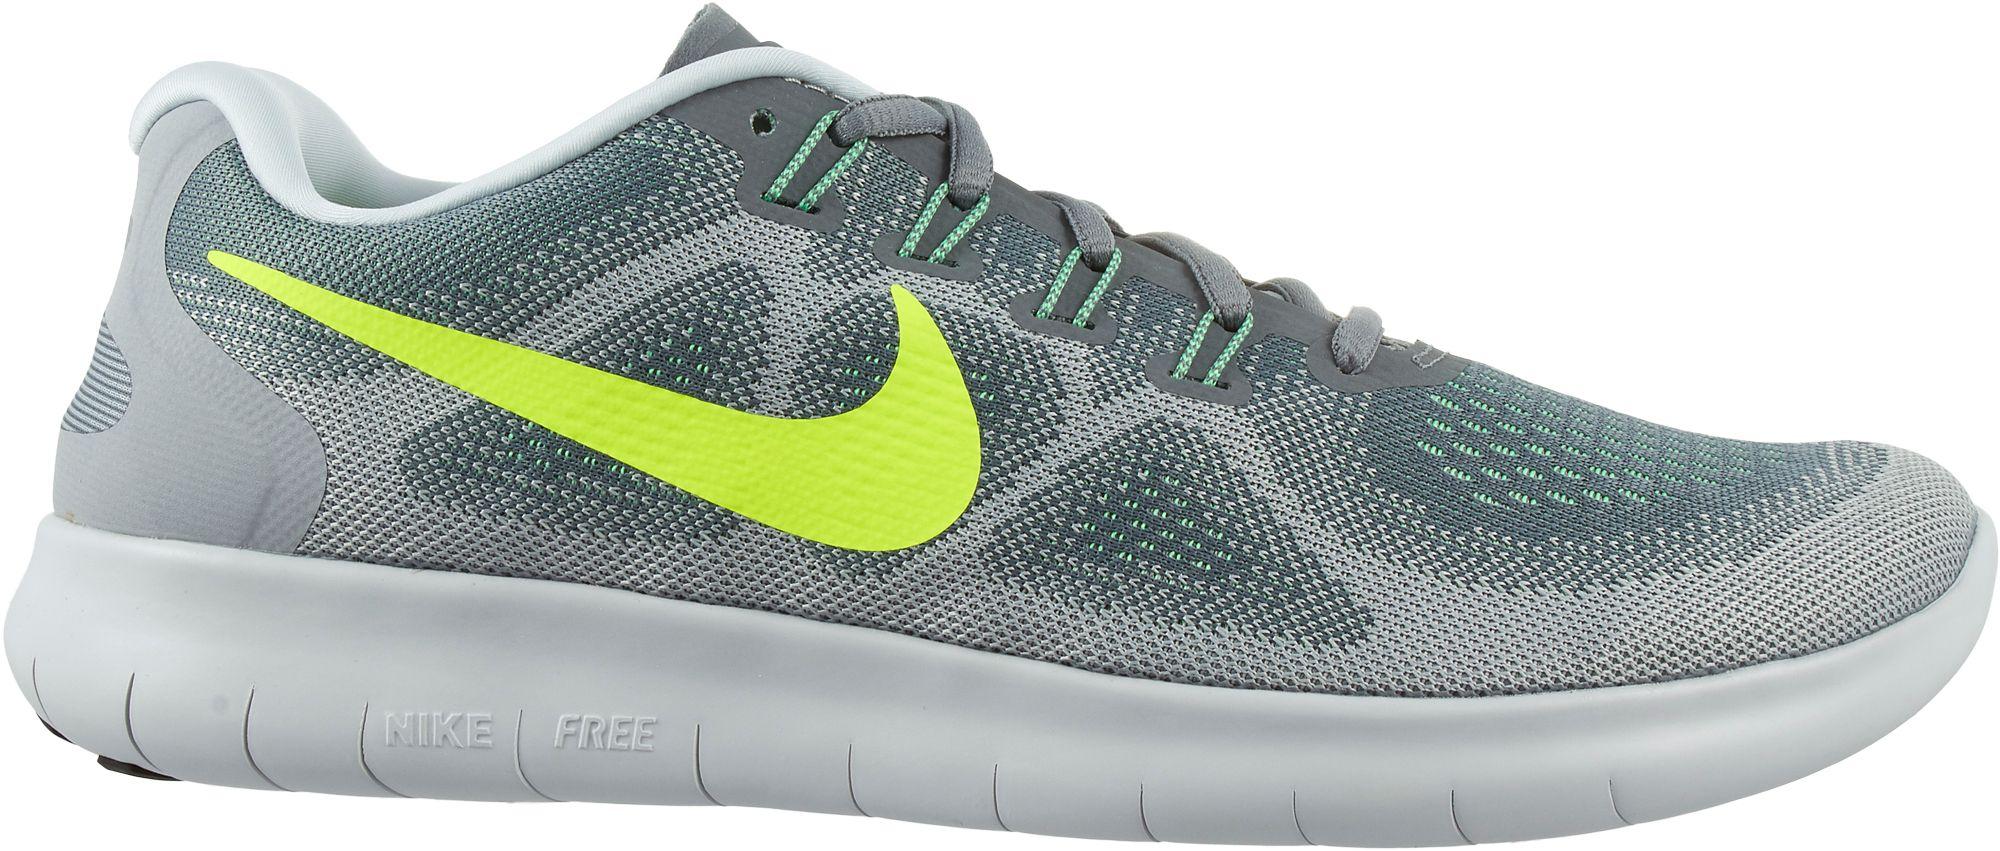 Nike Running Grey Orange Green Color Hair - Musée des ... ec7ffc14769dc